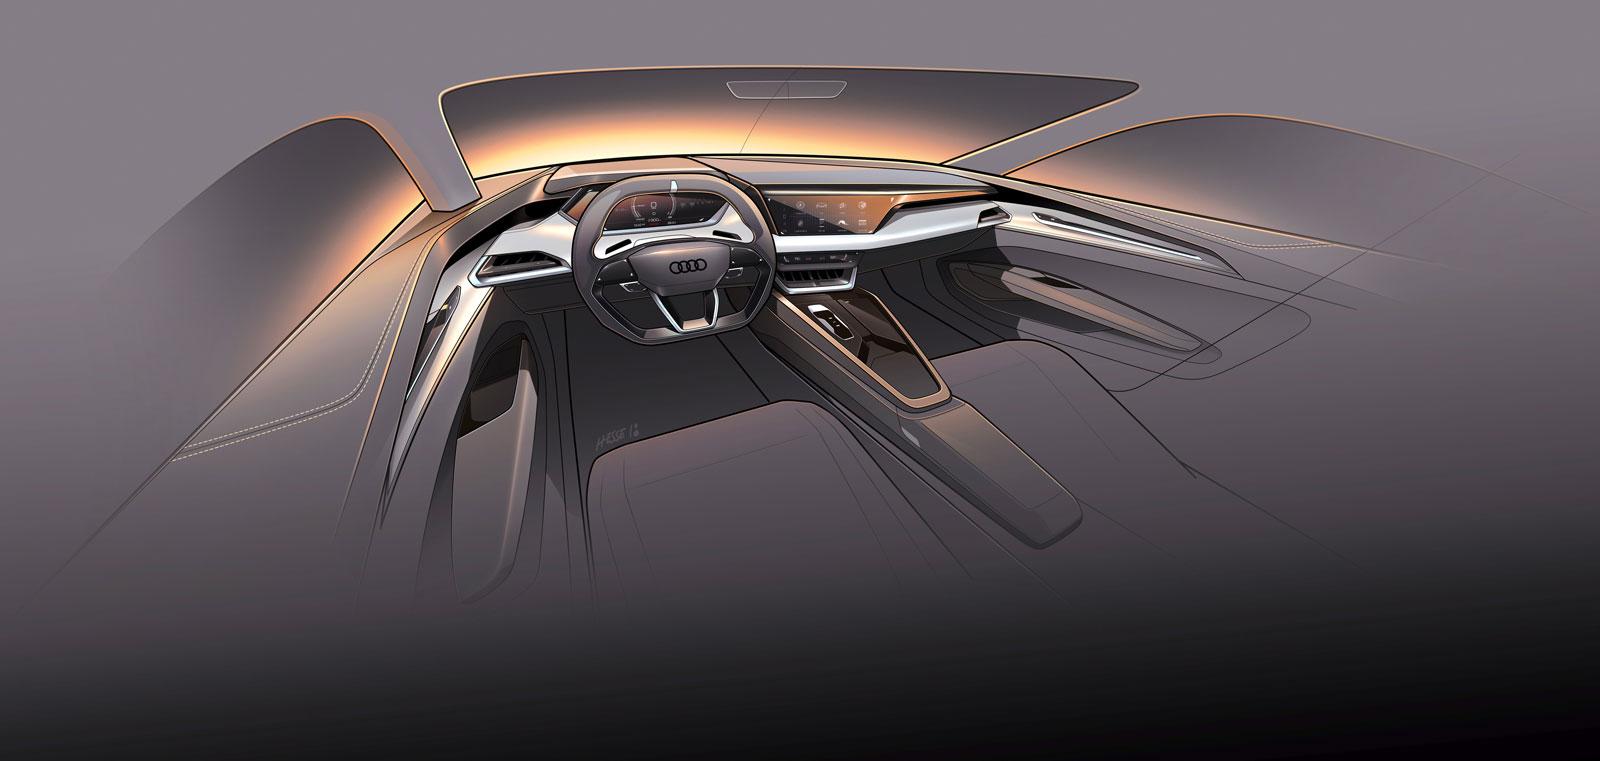 Audi E Tron Gt Concept Interior Design Sketch Render Car Body Design